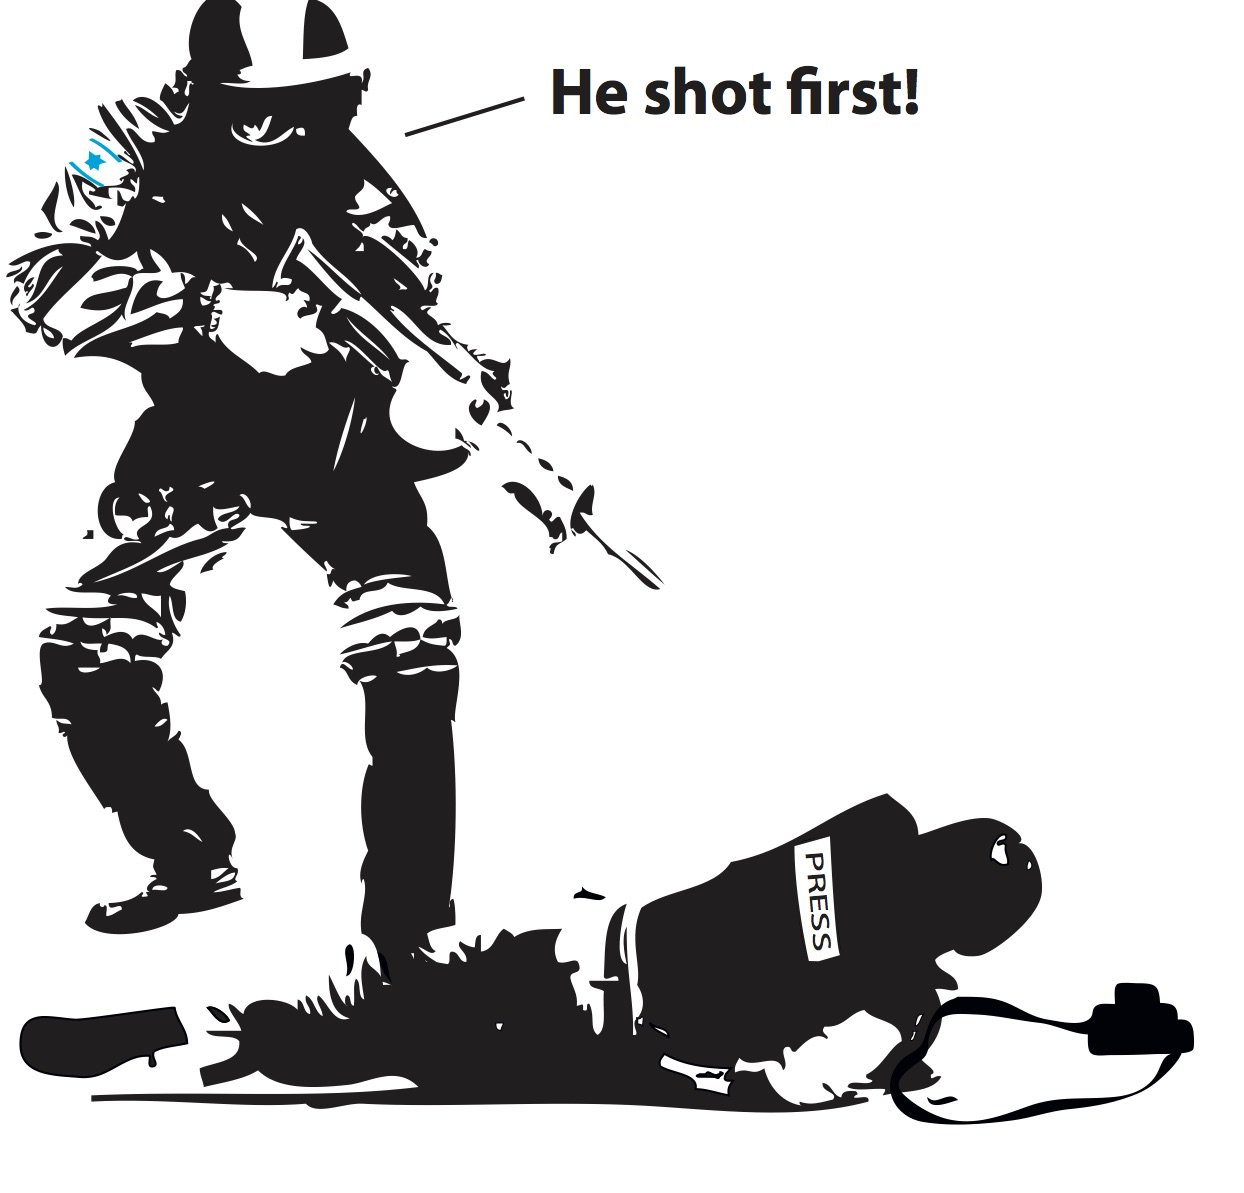 Cartoon van Khalid al-Baih - Who shot first - 7 april 2018